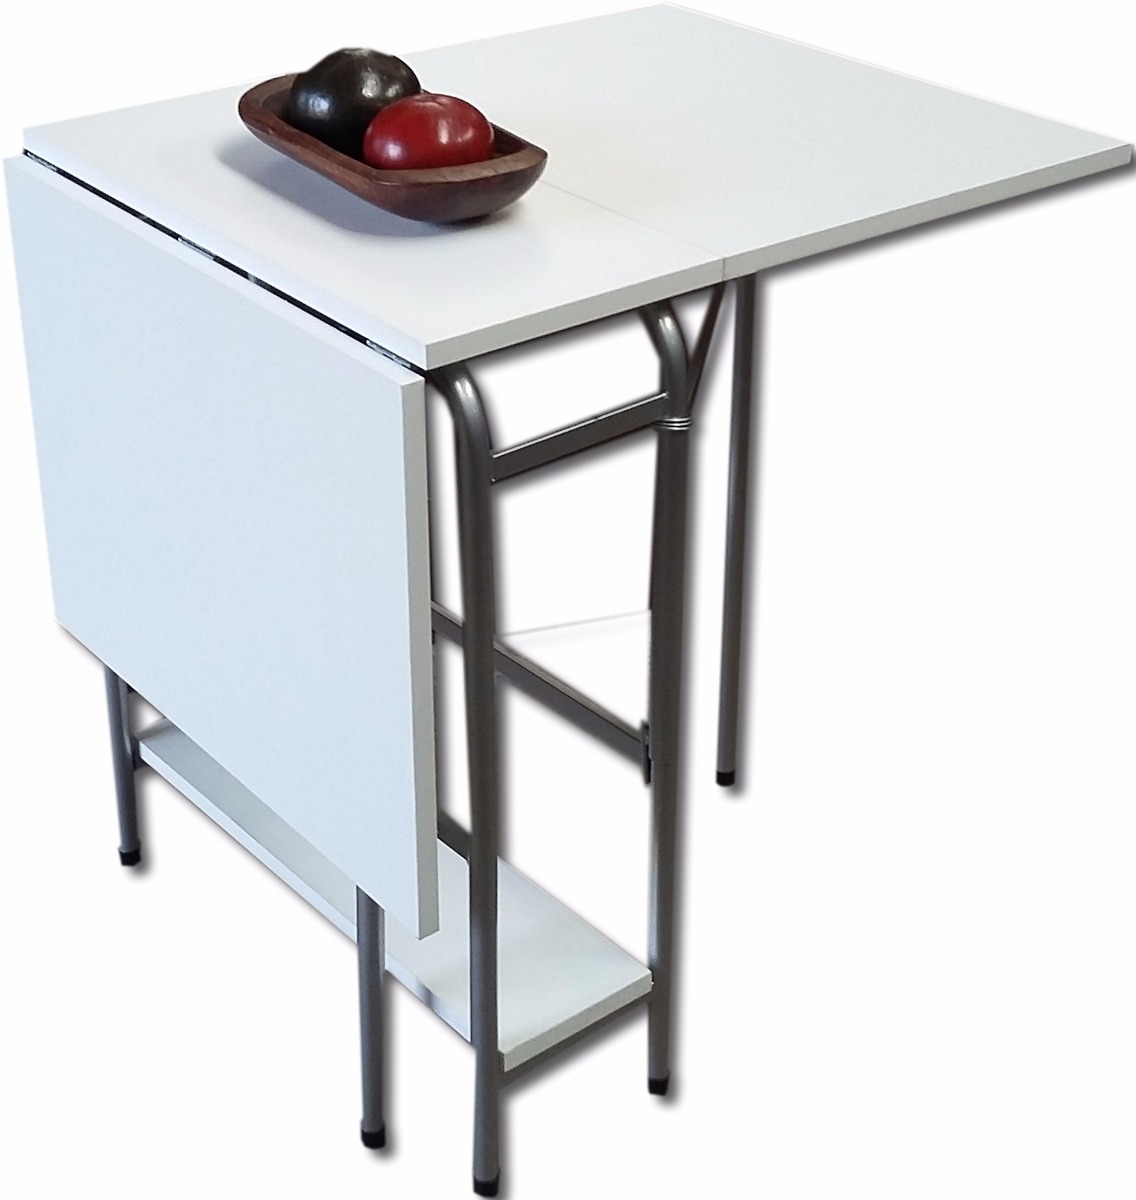 2 Plegable 1 6 Extensible Mesa Automatica X Mini Cocina 13lKJFcT